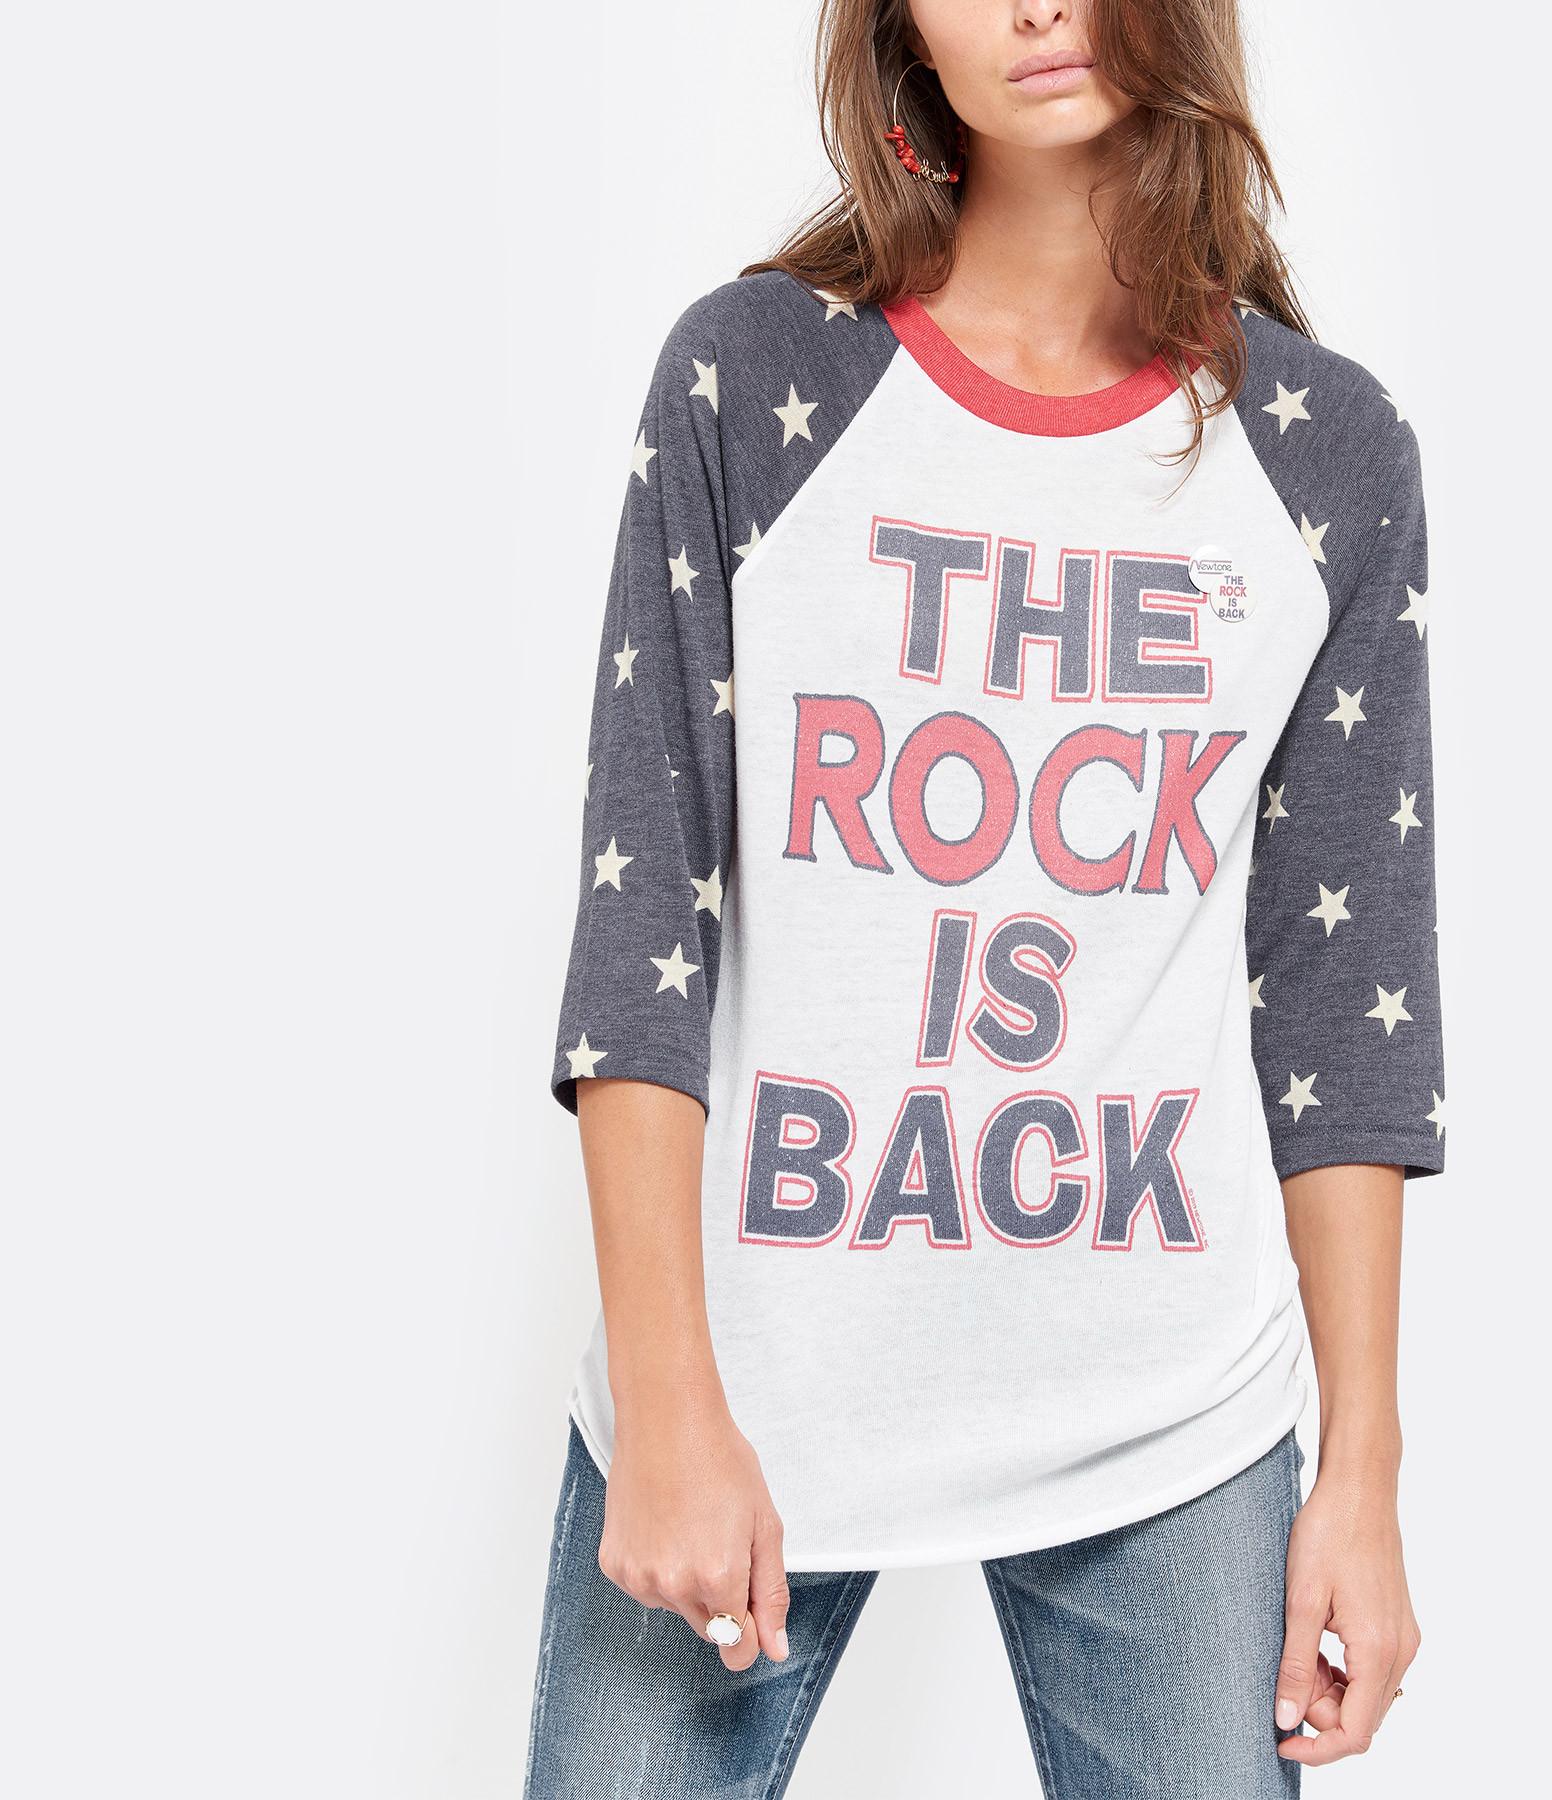 NEWTONE - Tee-shirt Baseball Coton Étoile